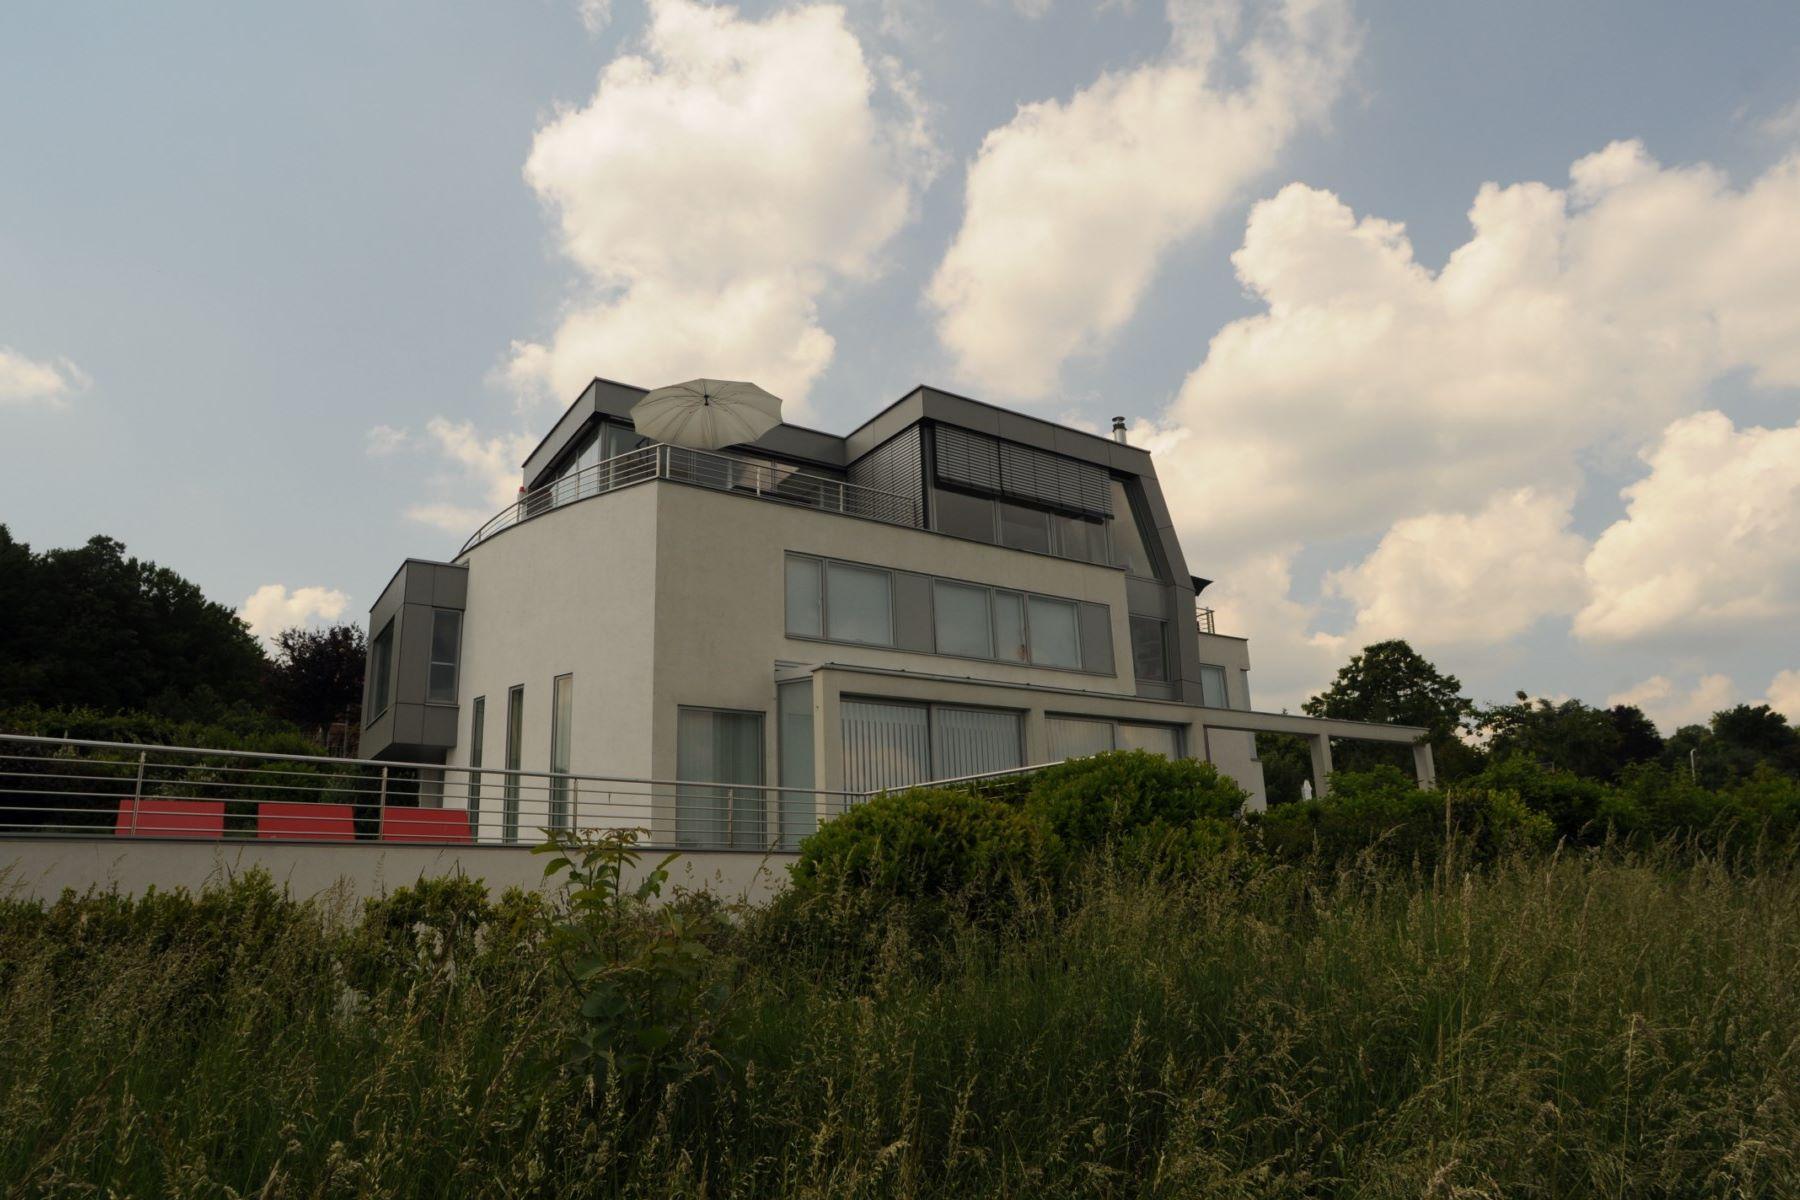 Объект для продажи Other Lower Austria